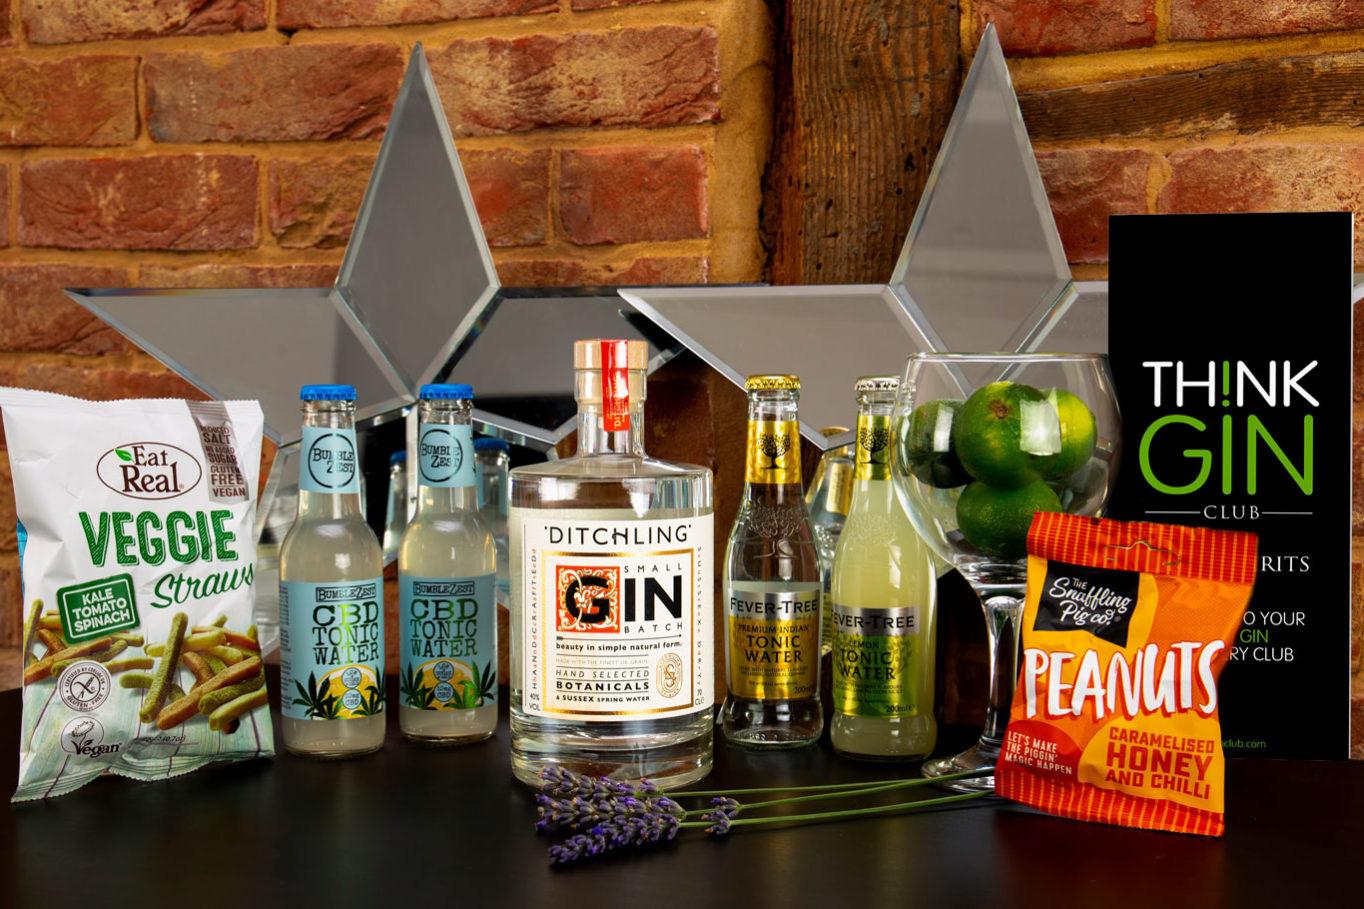 Think-Gin-Club-subscription-box